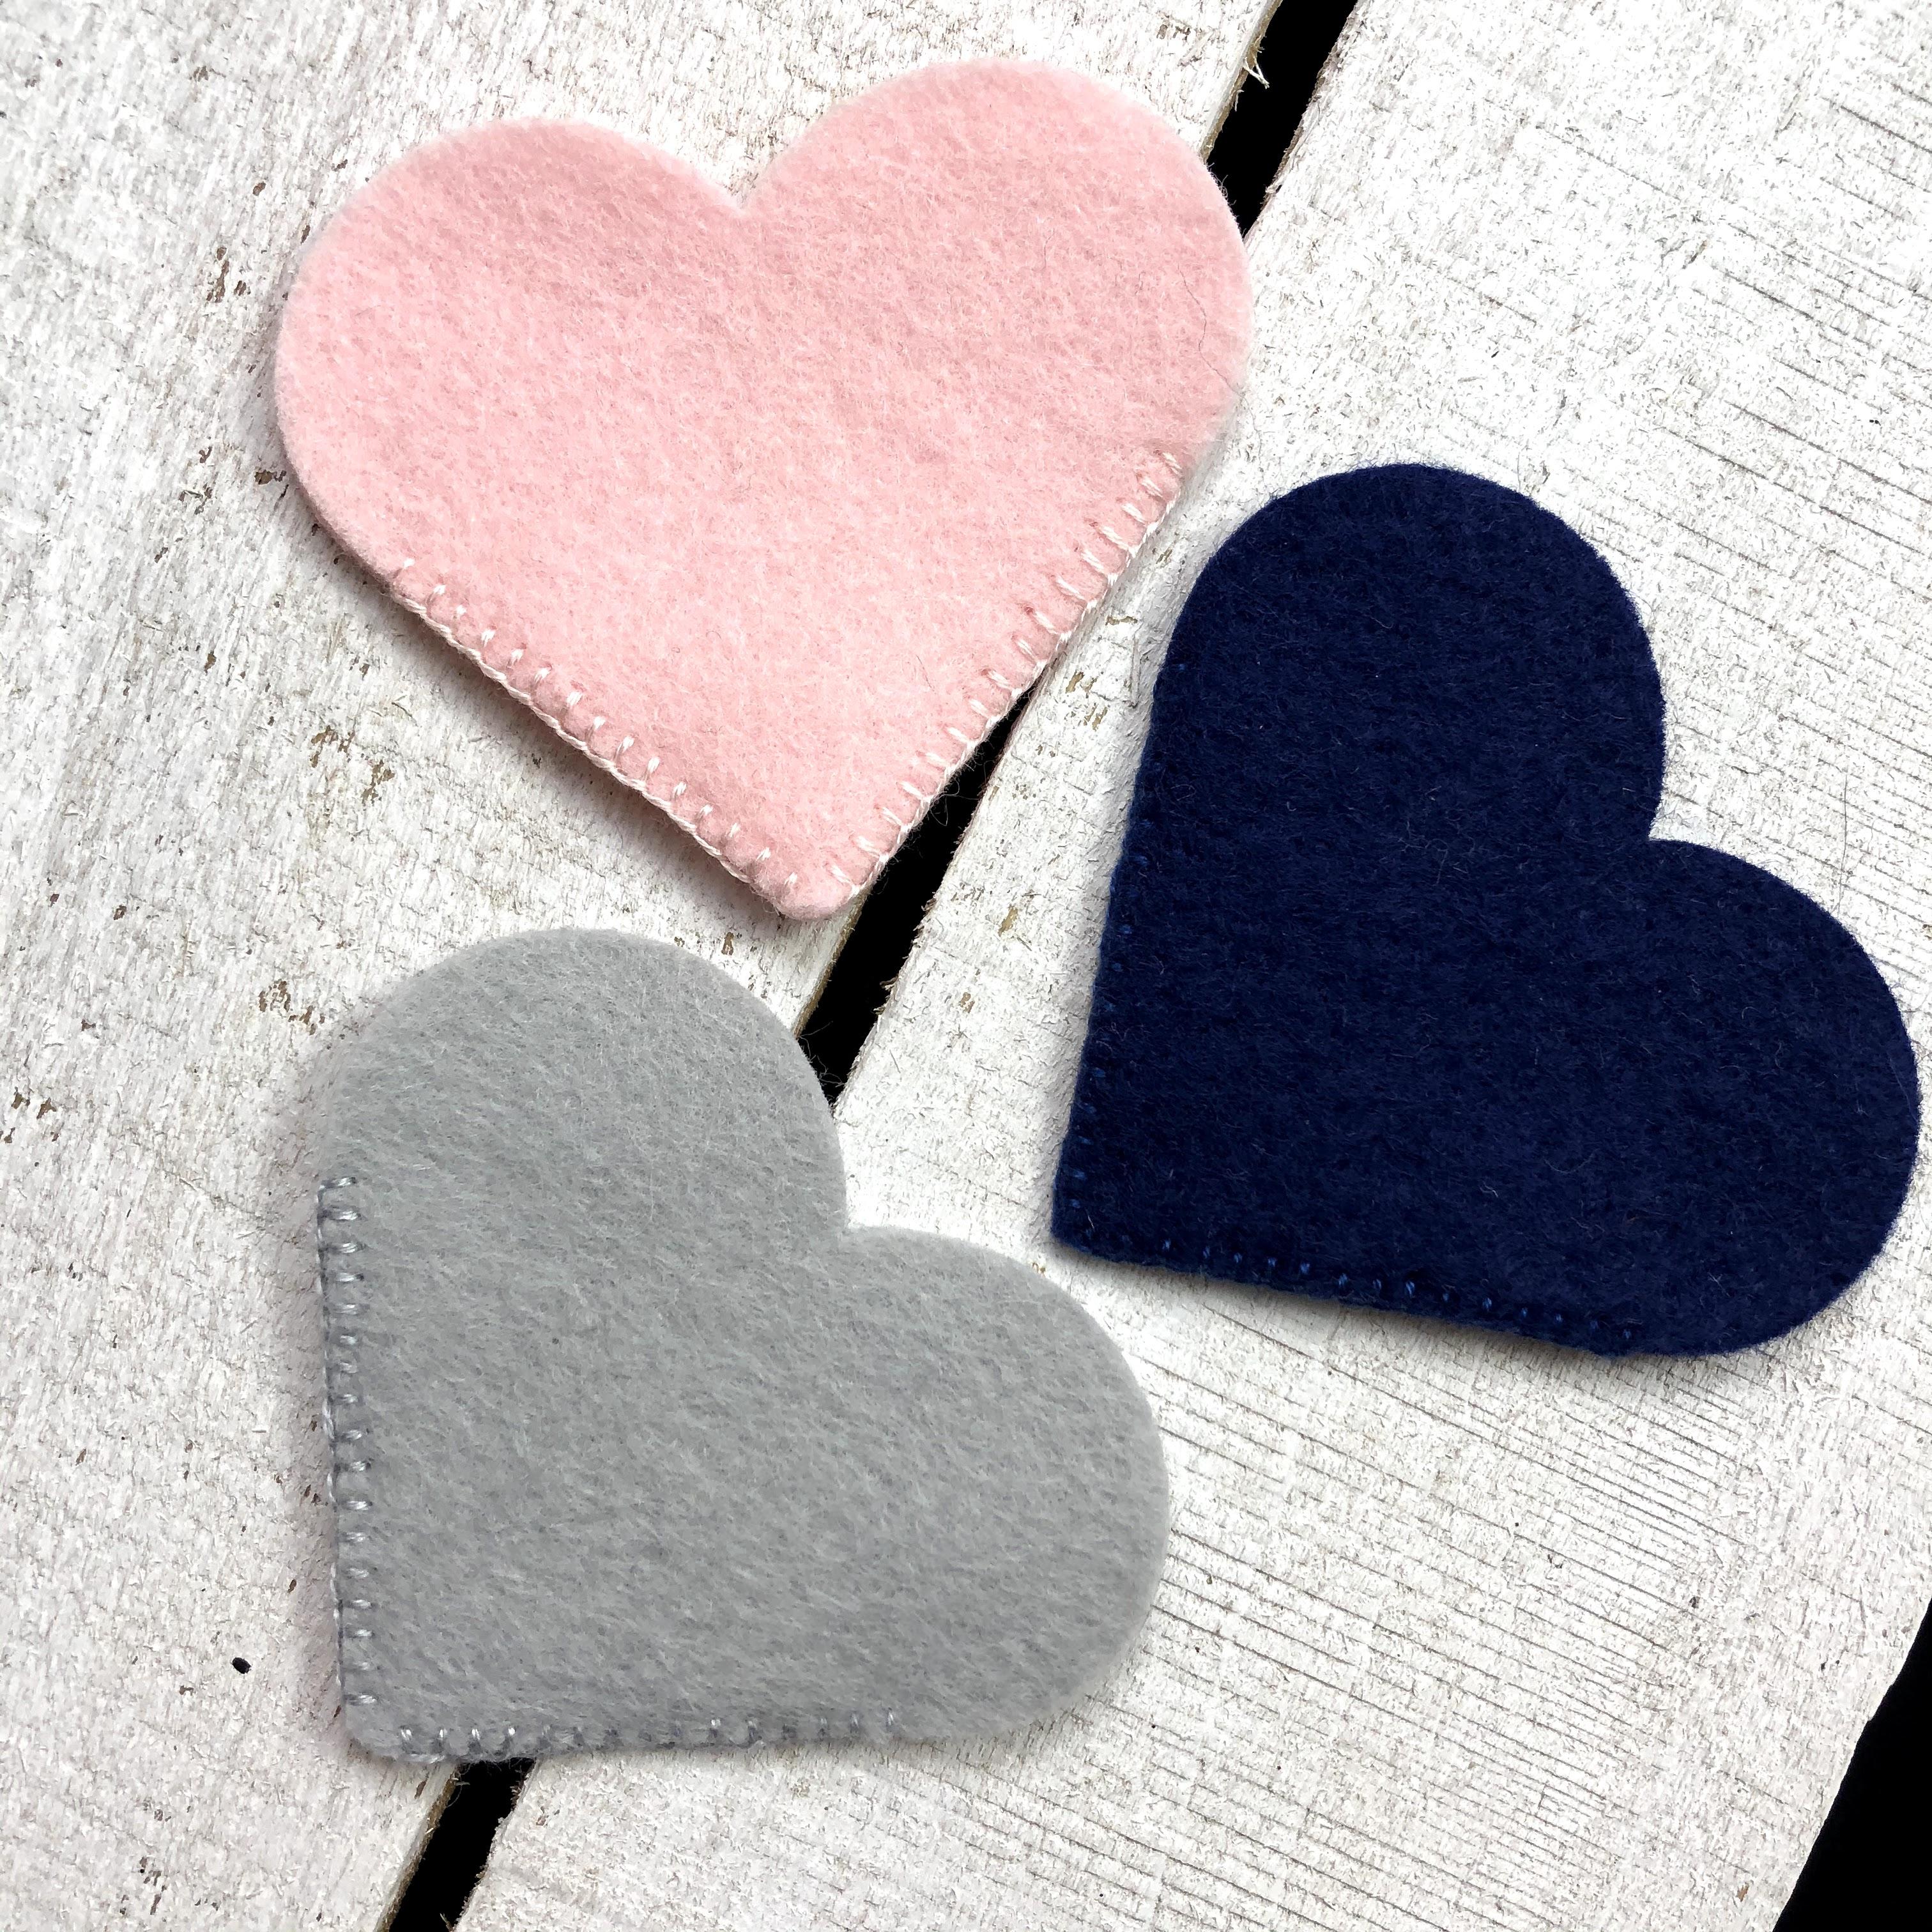 Thumbnail: Heart Bookmark